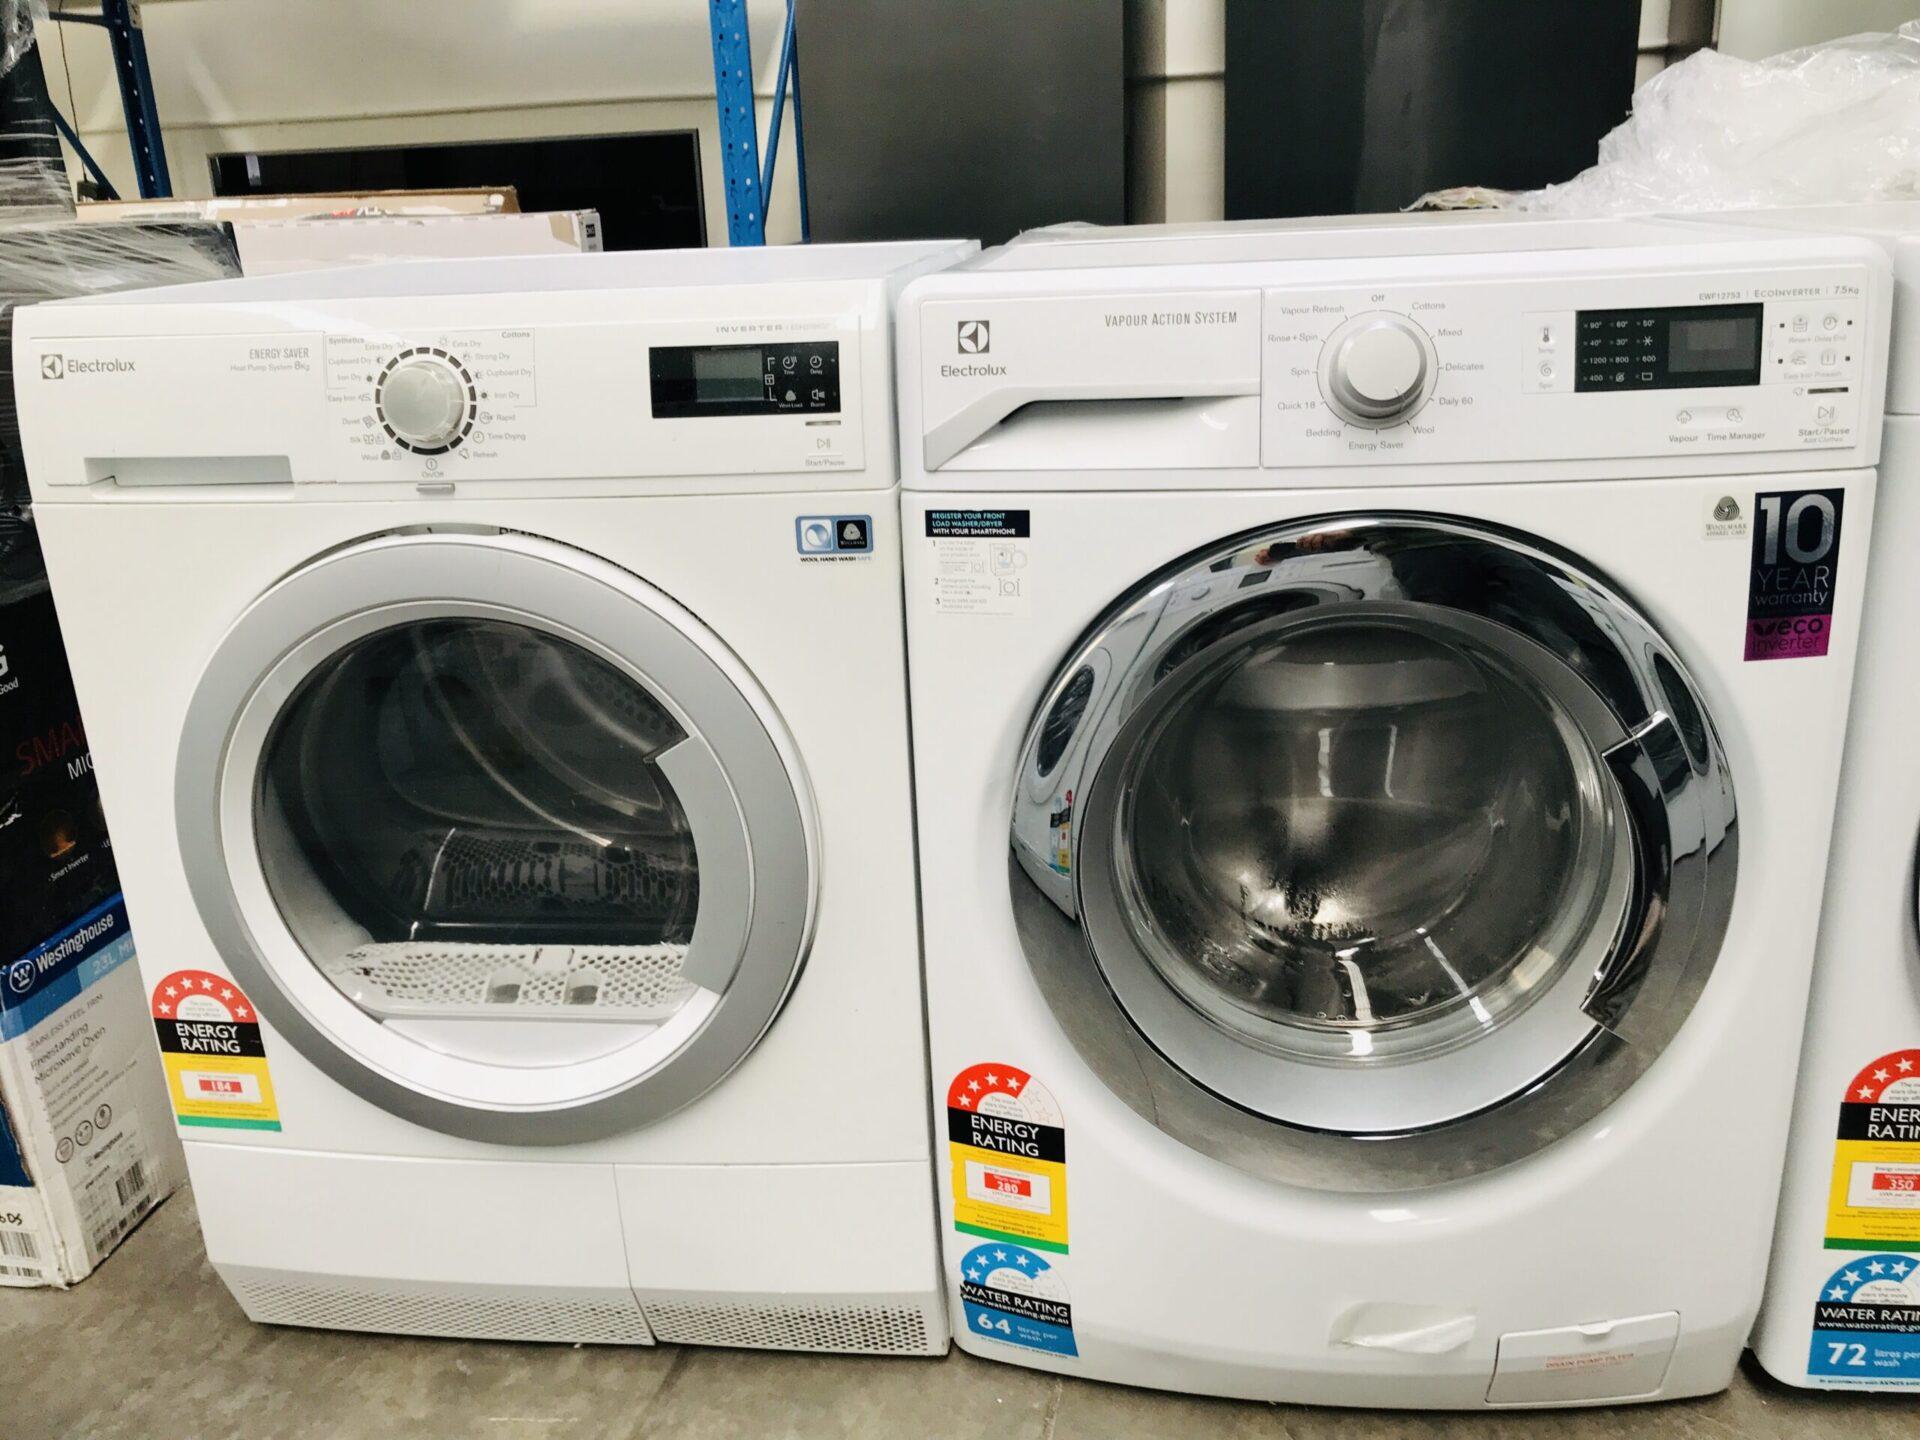 Electrolux 7.5 Kg Front Load Washing Machine & Electrolux 8kg Heat Pump Dryer 6 Stars Energy Rating  EWF7524CDWA EDH3786GDW